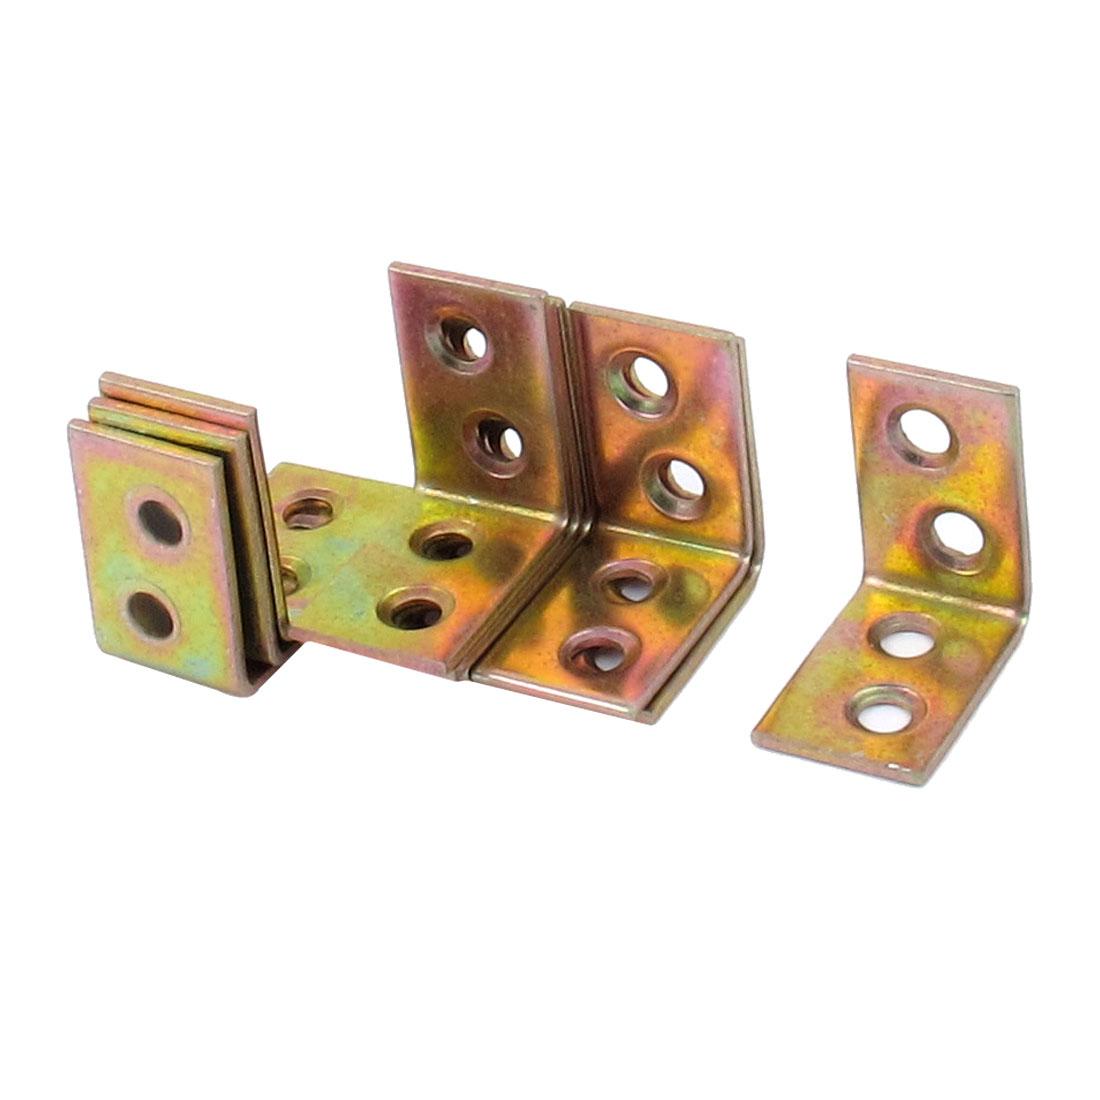 26mmx26mmx16mm 90 Degree 4 Hole Design Shelf Support Corner Right Angle Bracket 10pcs